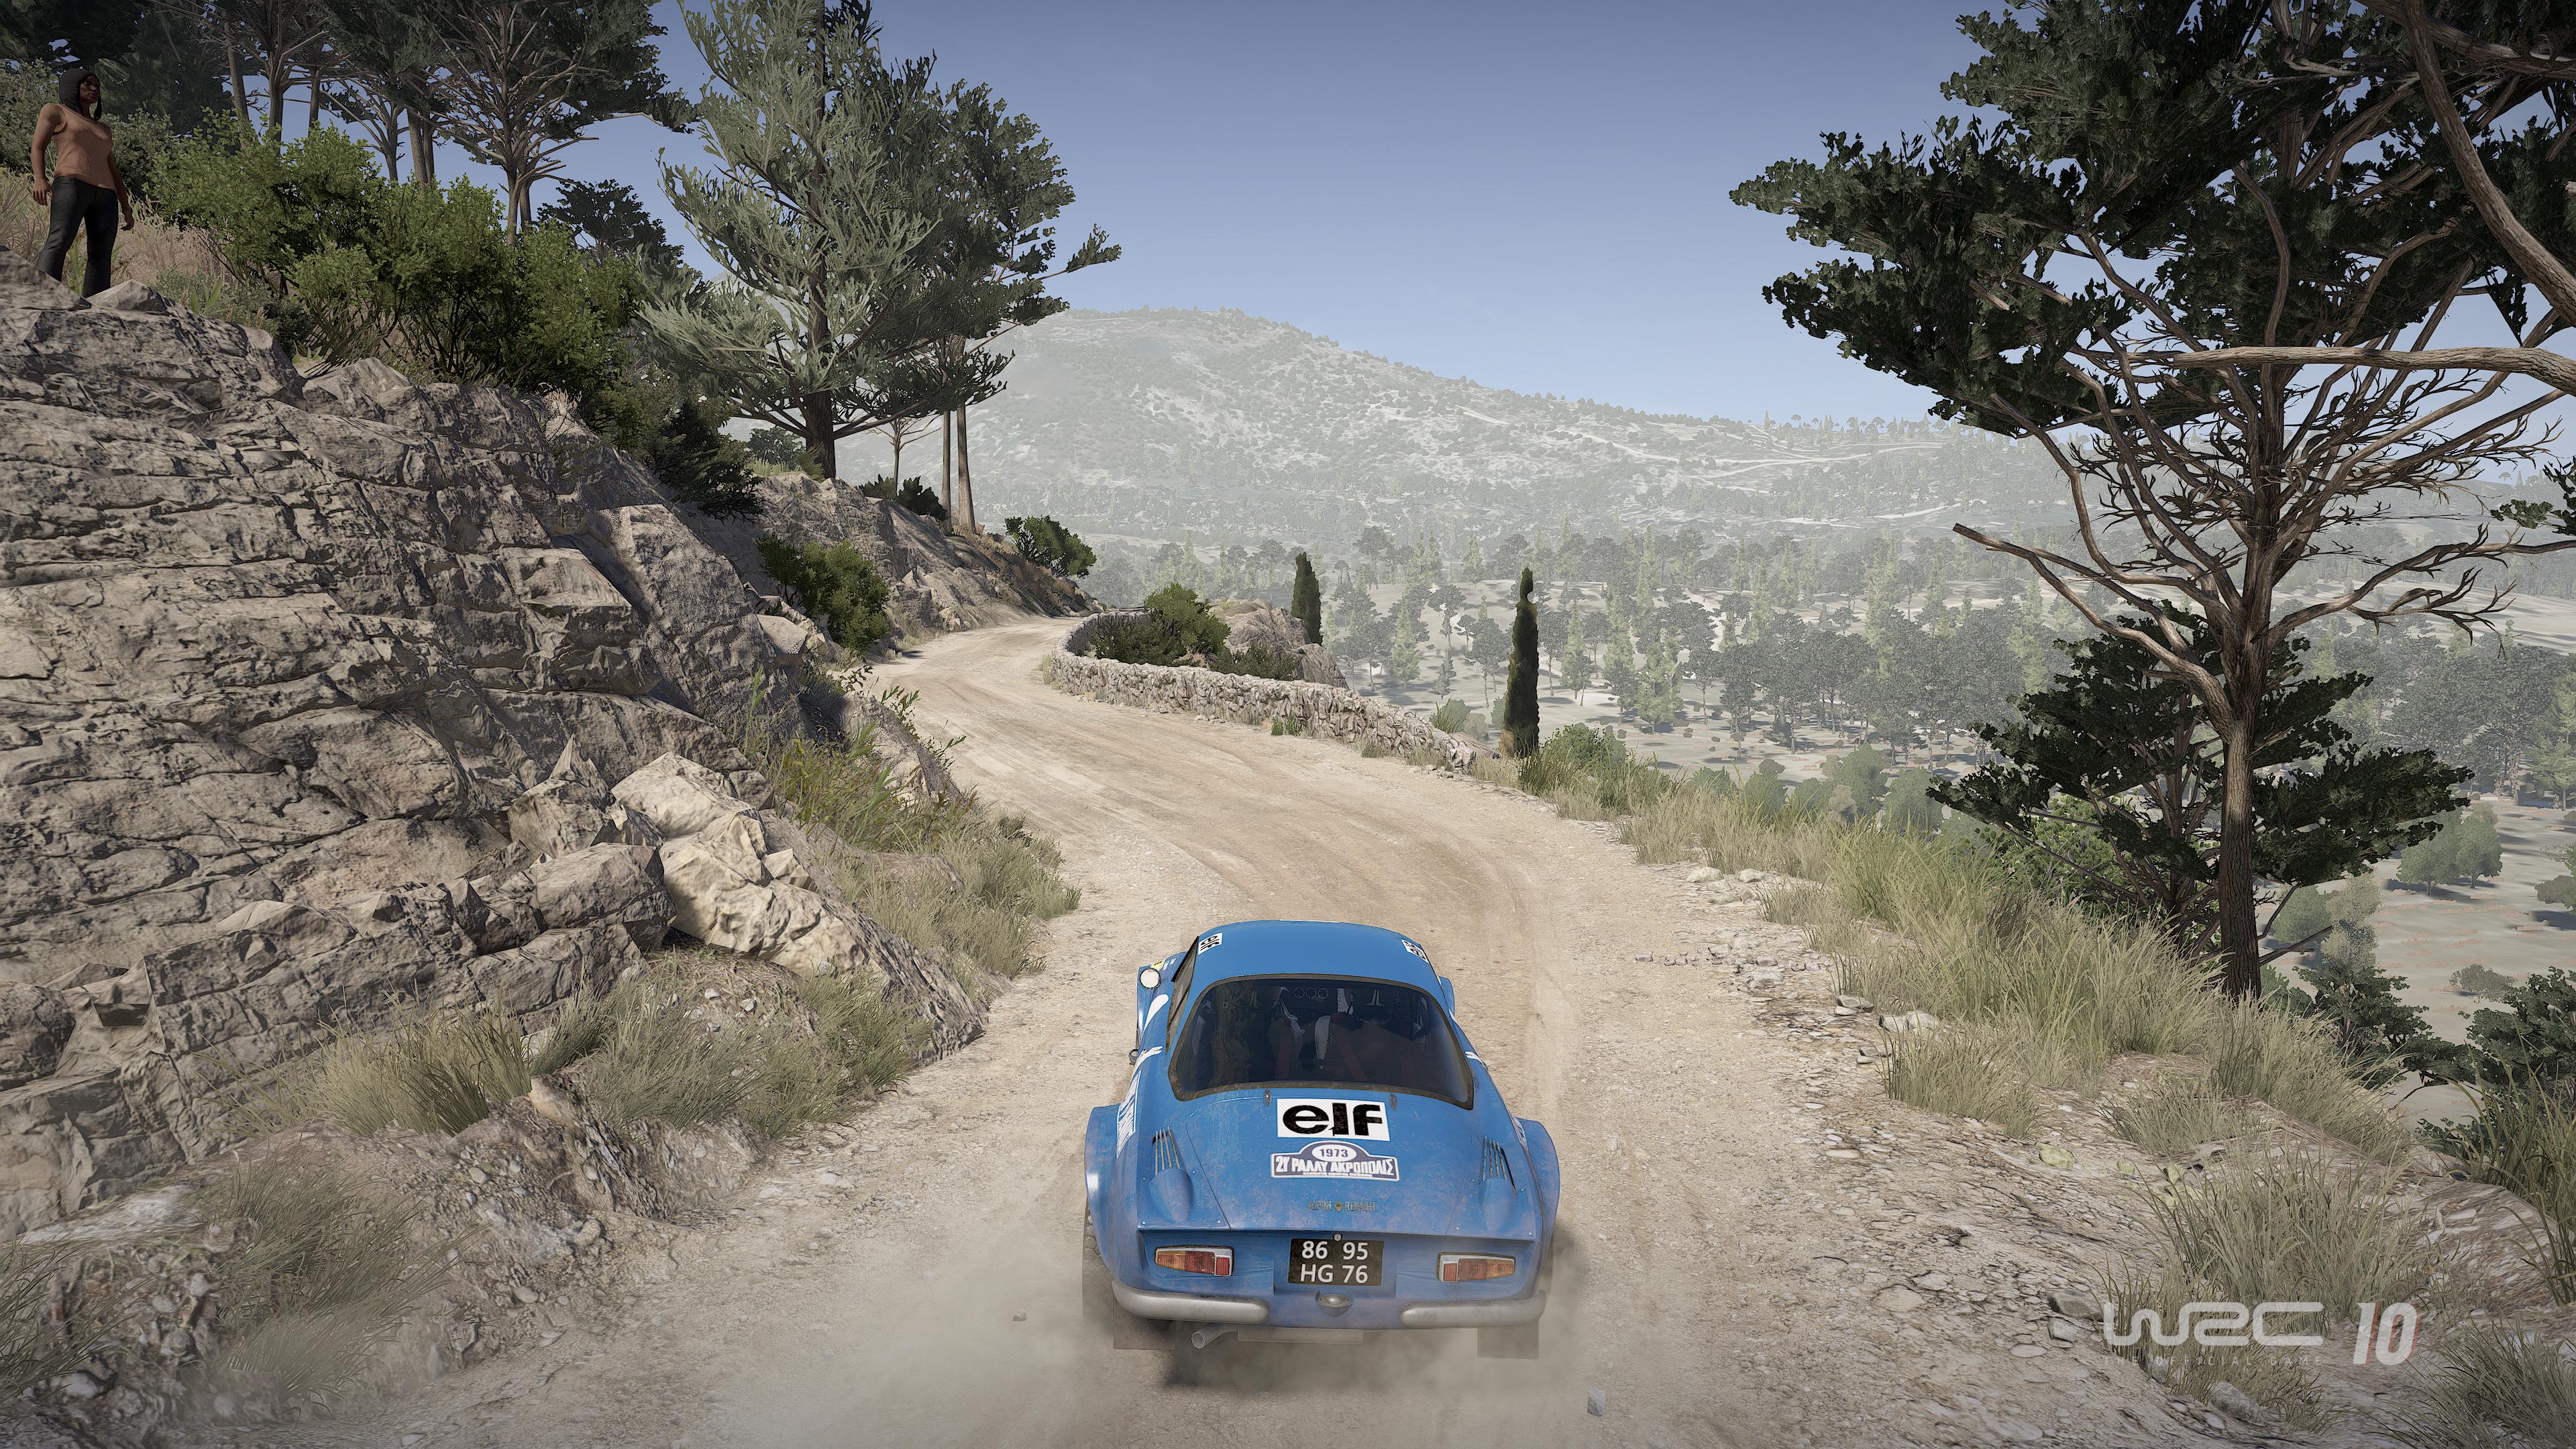 Wrc 10 Fia World Rally Championship Screenshot 2021.08.29 - 11.33.05.05